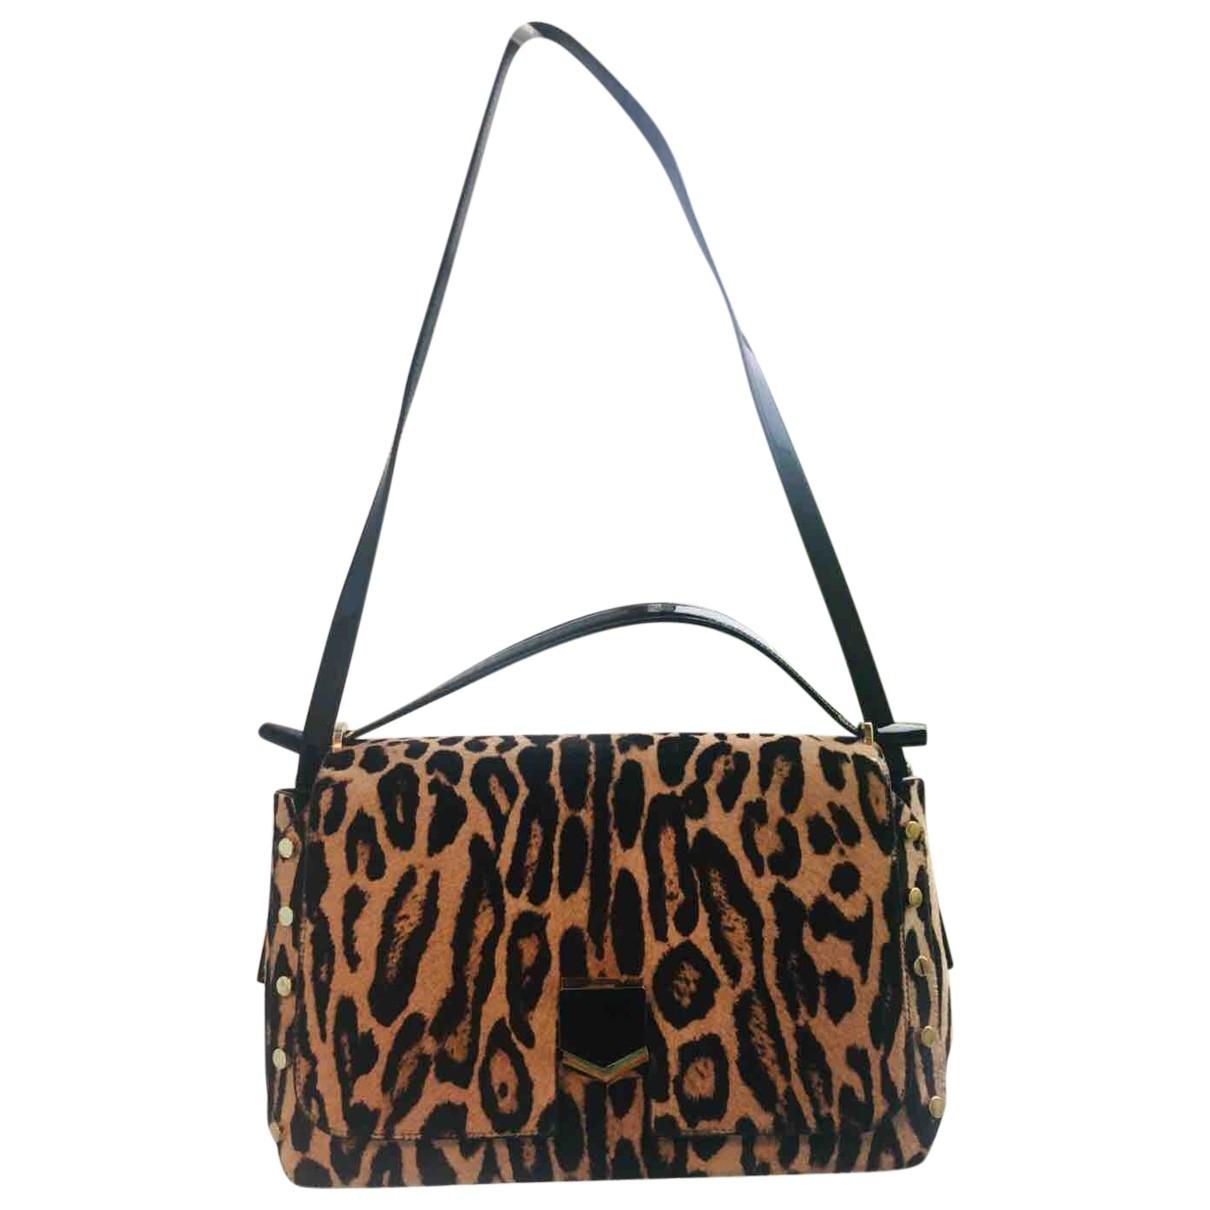 Jimmy Choo Lockett Brown Pony-style calfskin handbag for Women \N